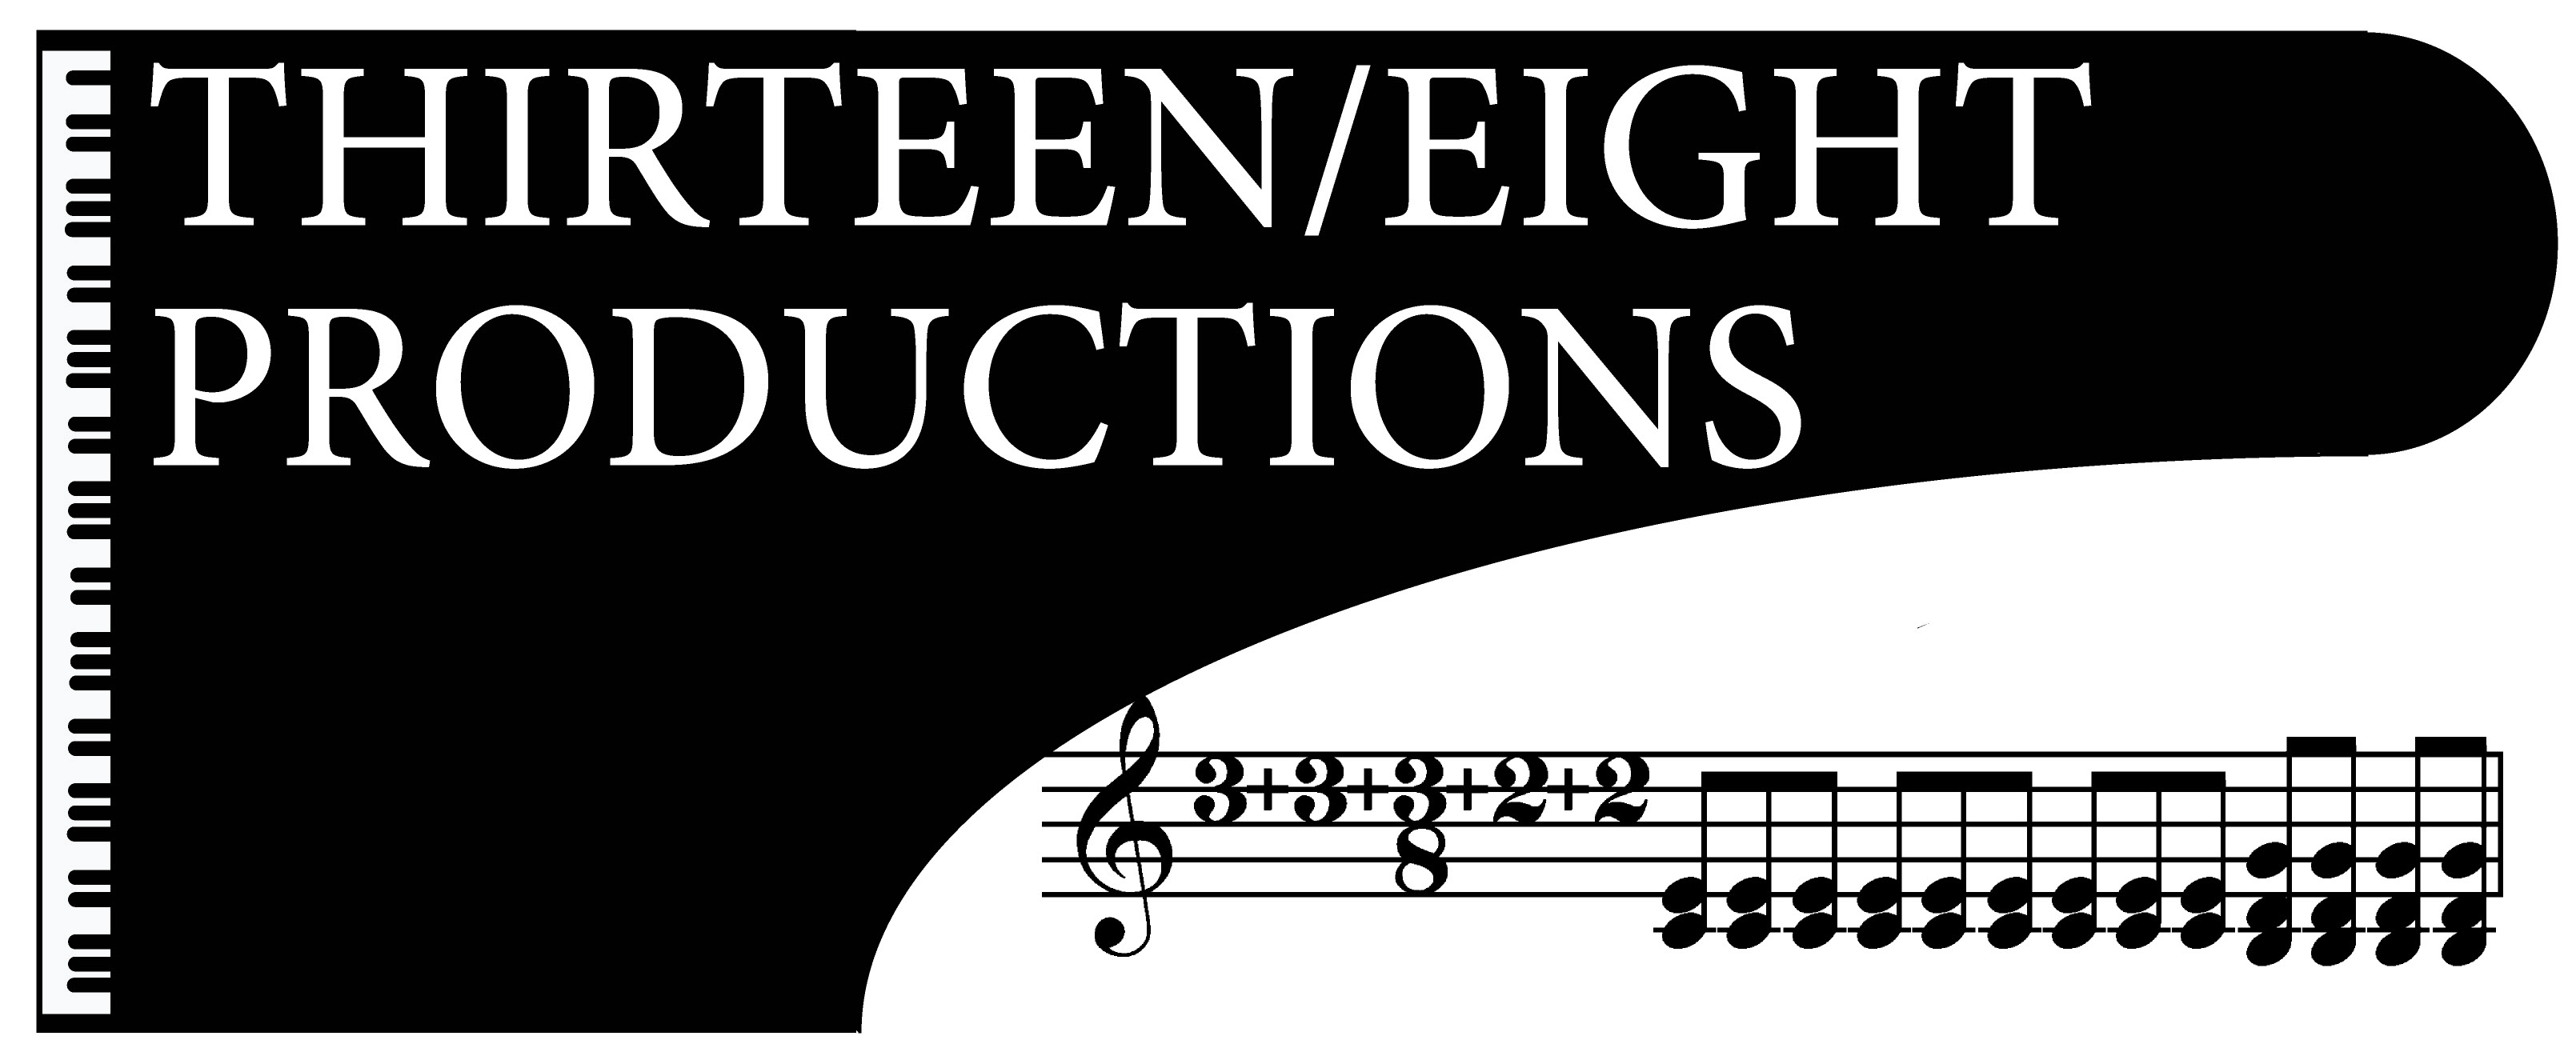 Thirteen/Eight Productions